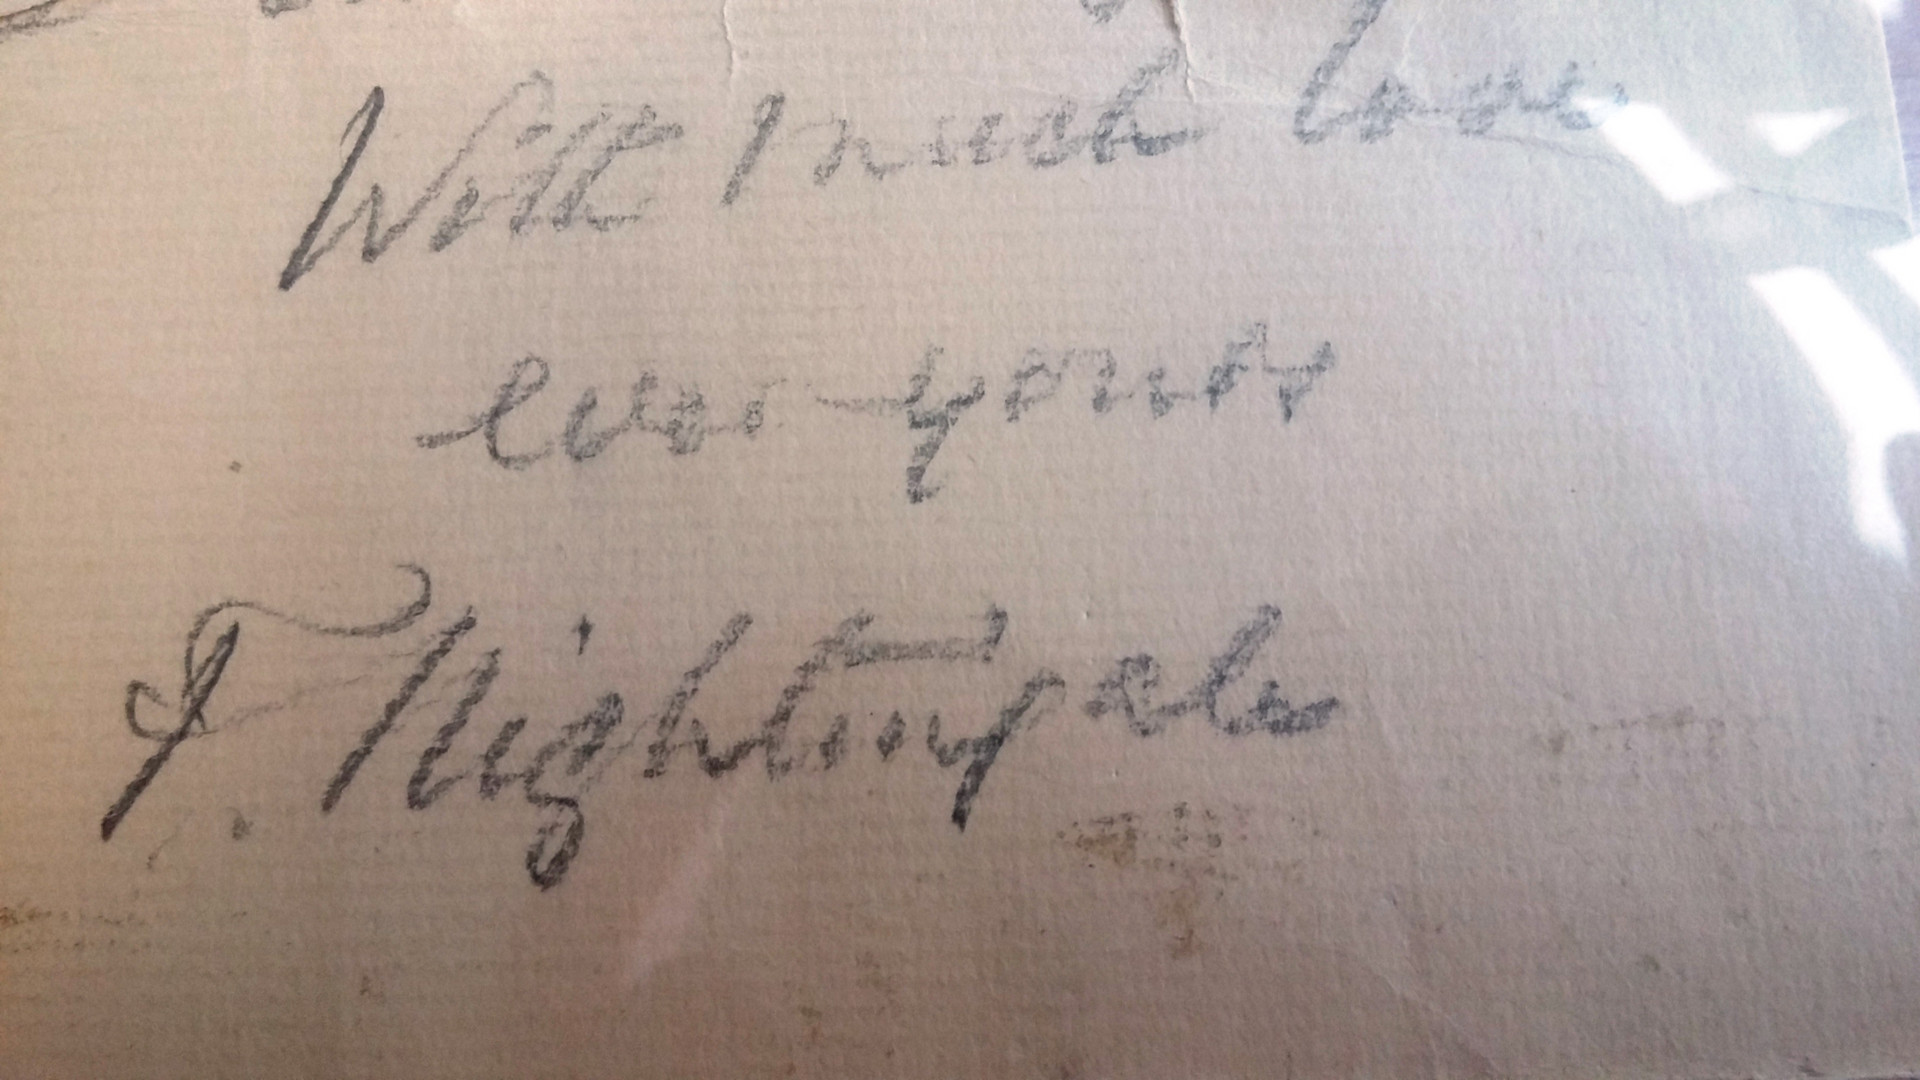 Florence Nightingale's Signature_edited.